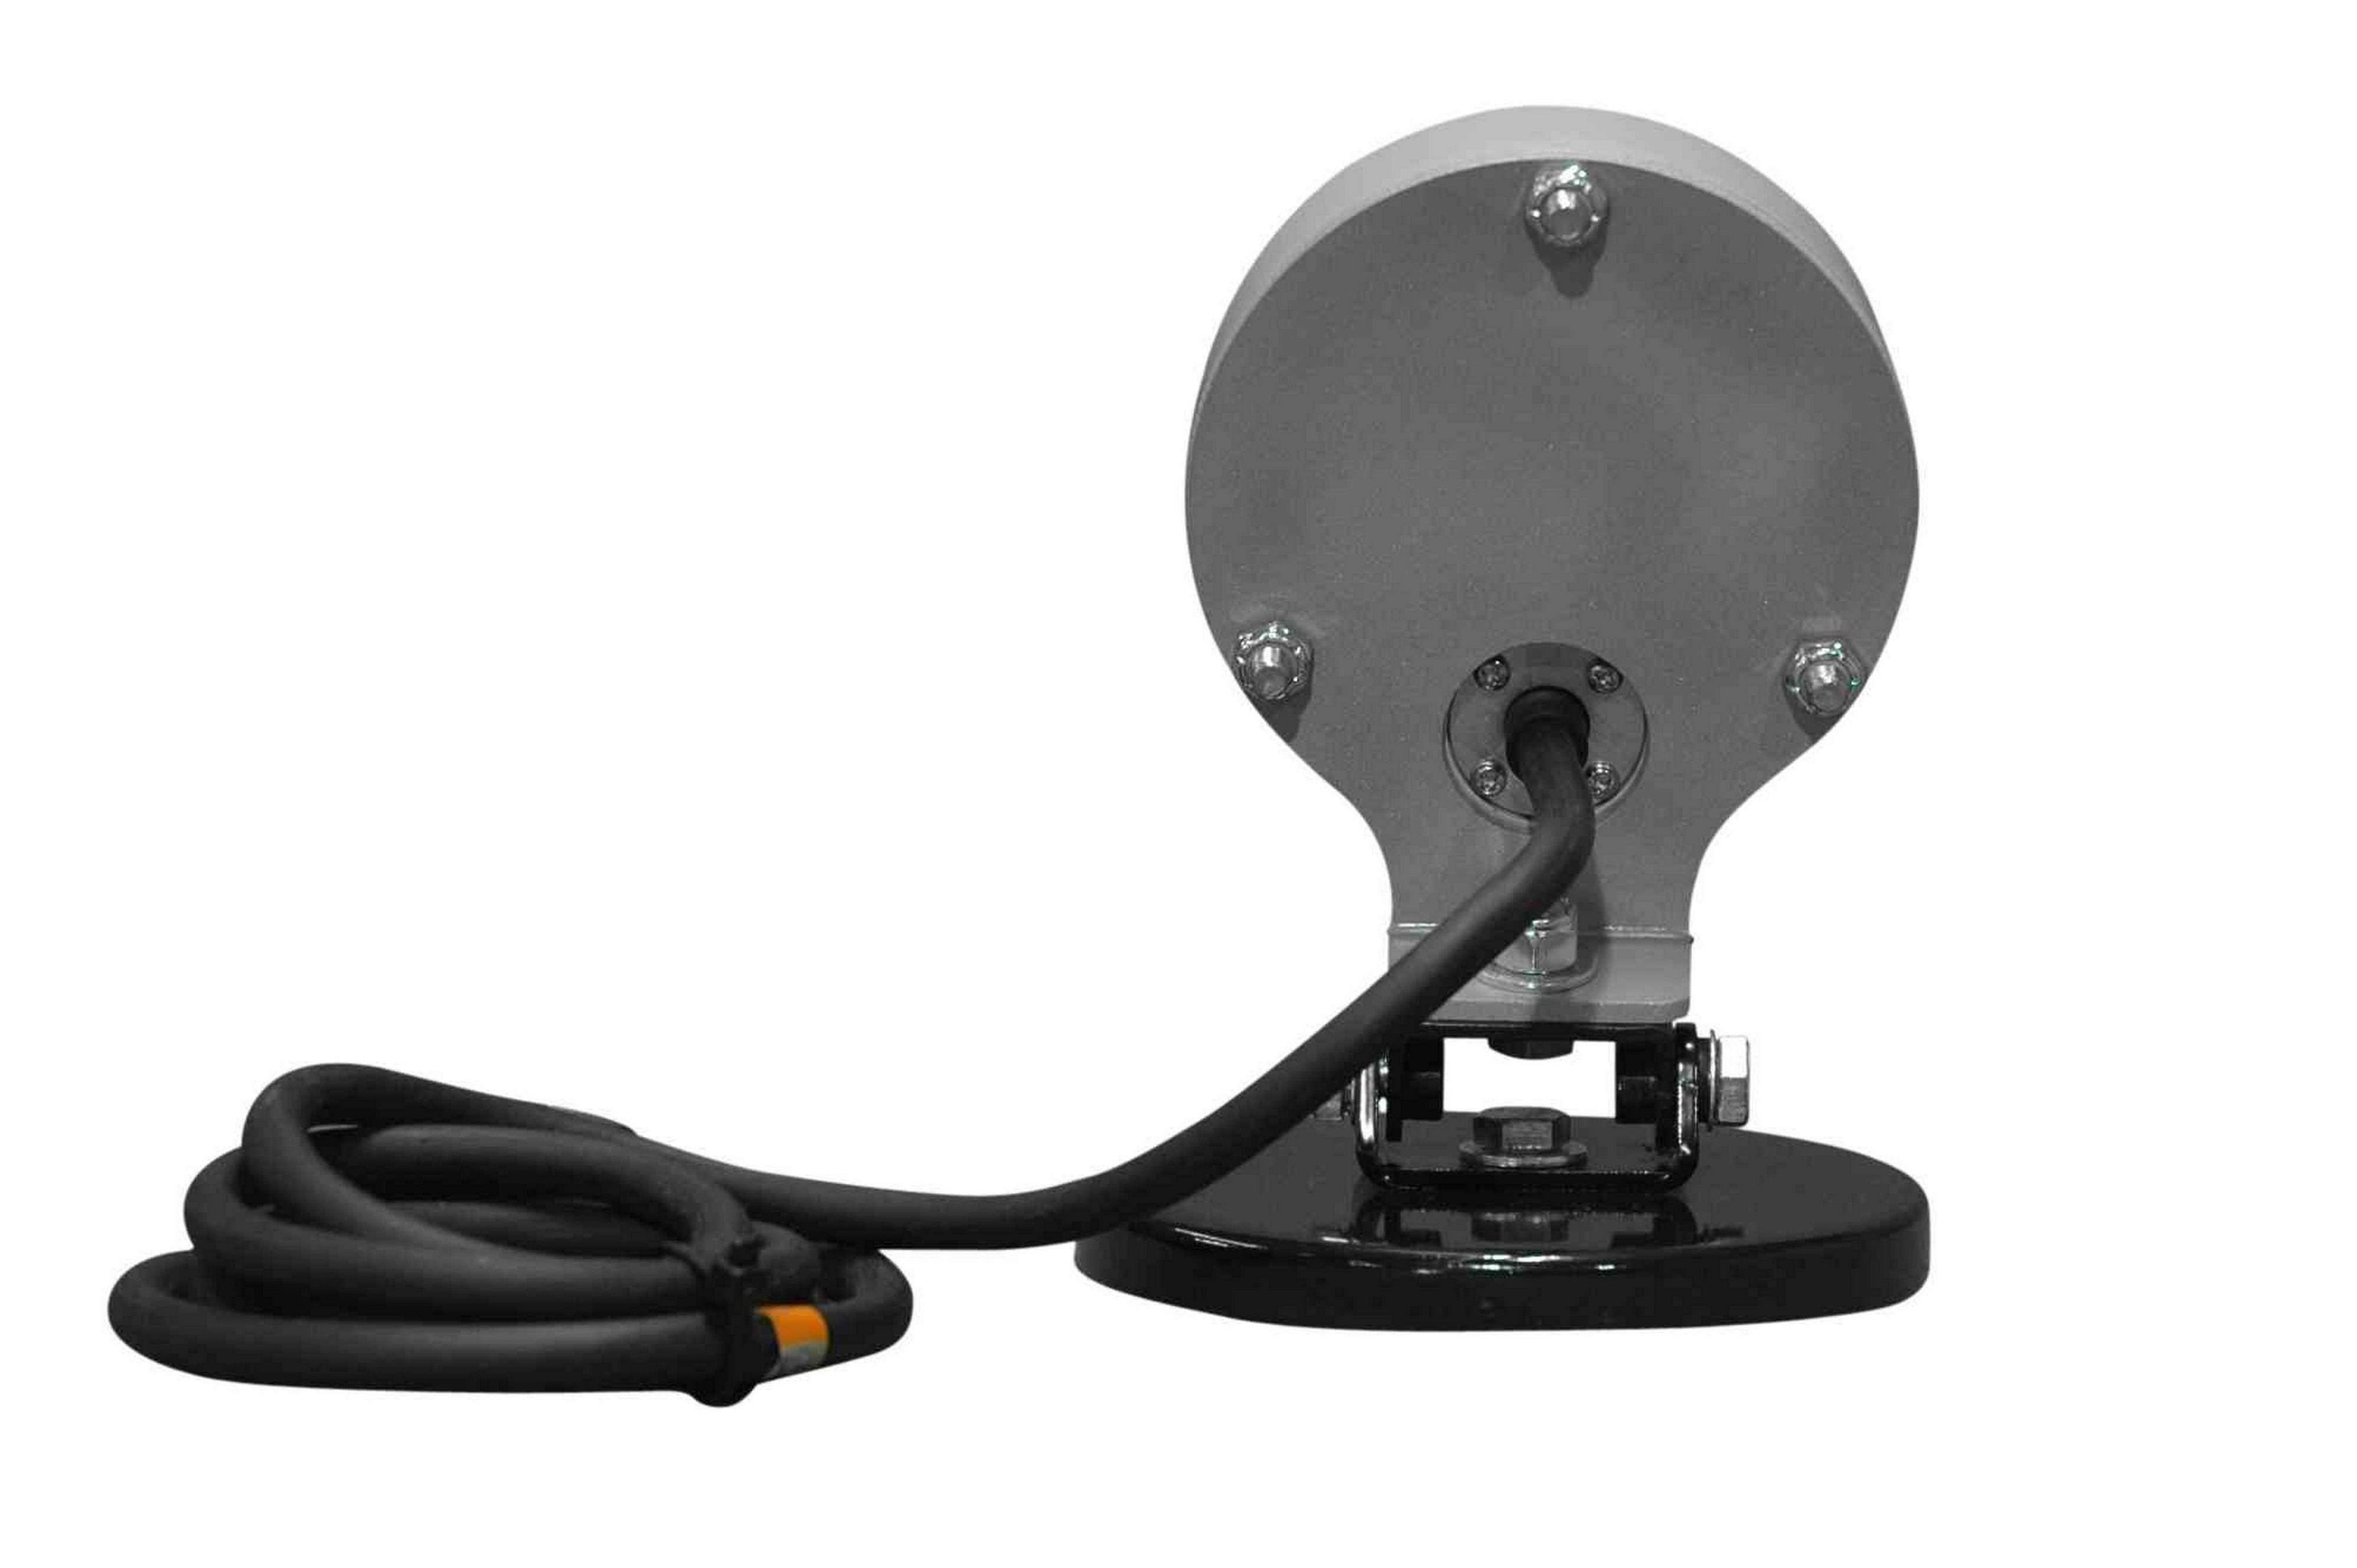 800 Lumens Magnetic Base -Infrared850-Spot-16 Straight Cord 2-pin Deutsch Connector Aluminum Housing 12 Watts ML-LEDLB-4R